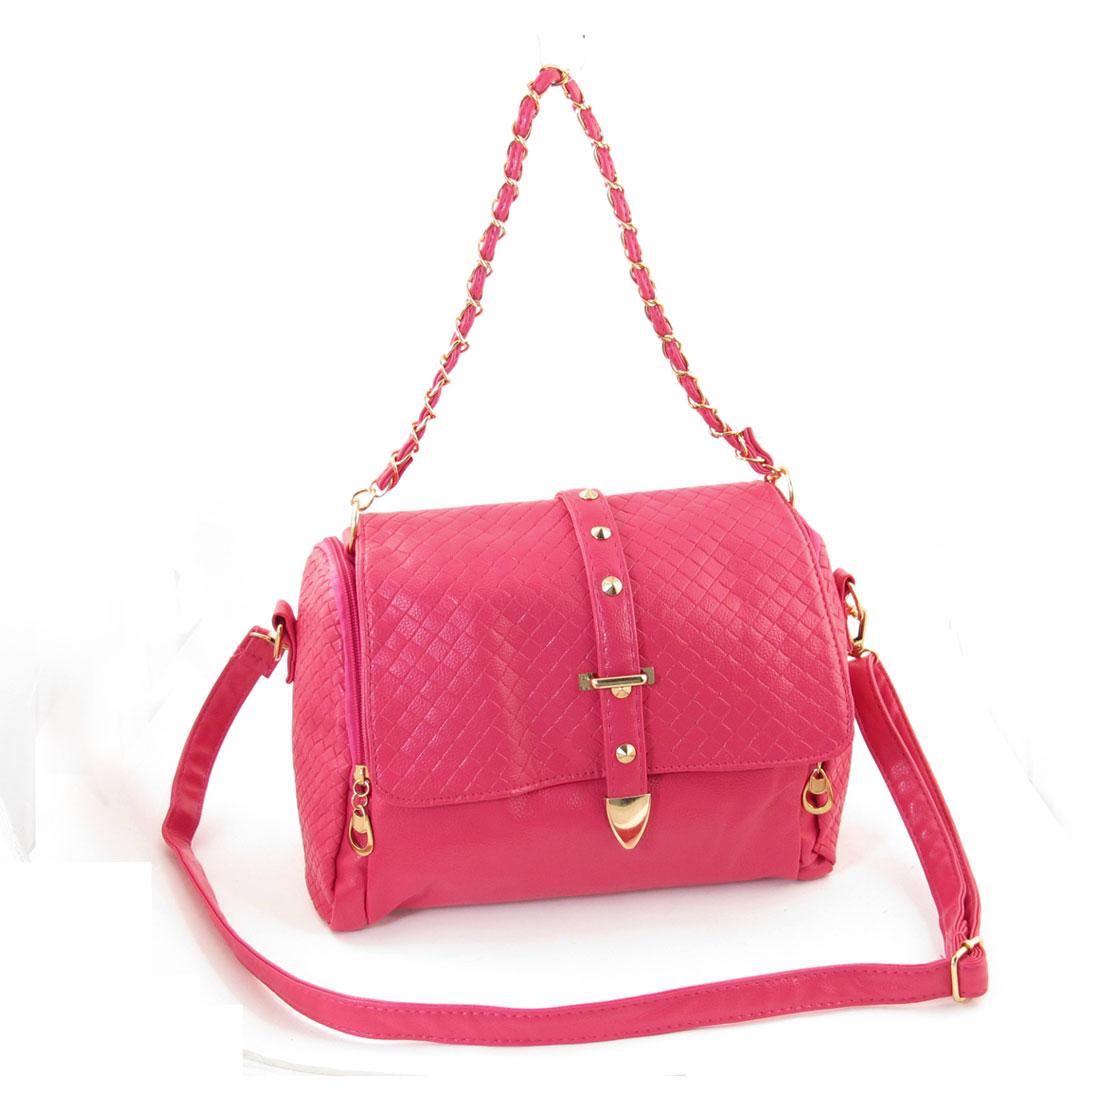 Zip Up Pockets Detachable Lobster Clasp Shoulder Strap Handbag Fuchsia for Women